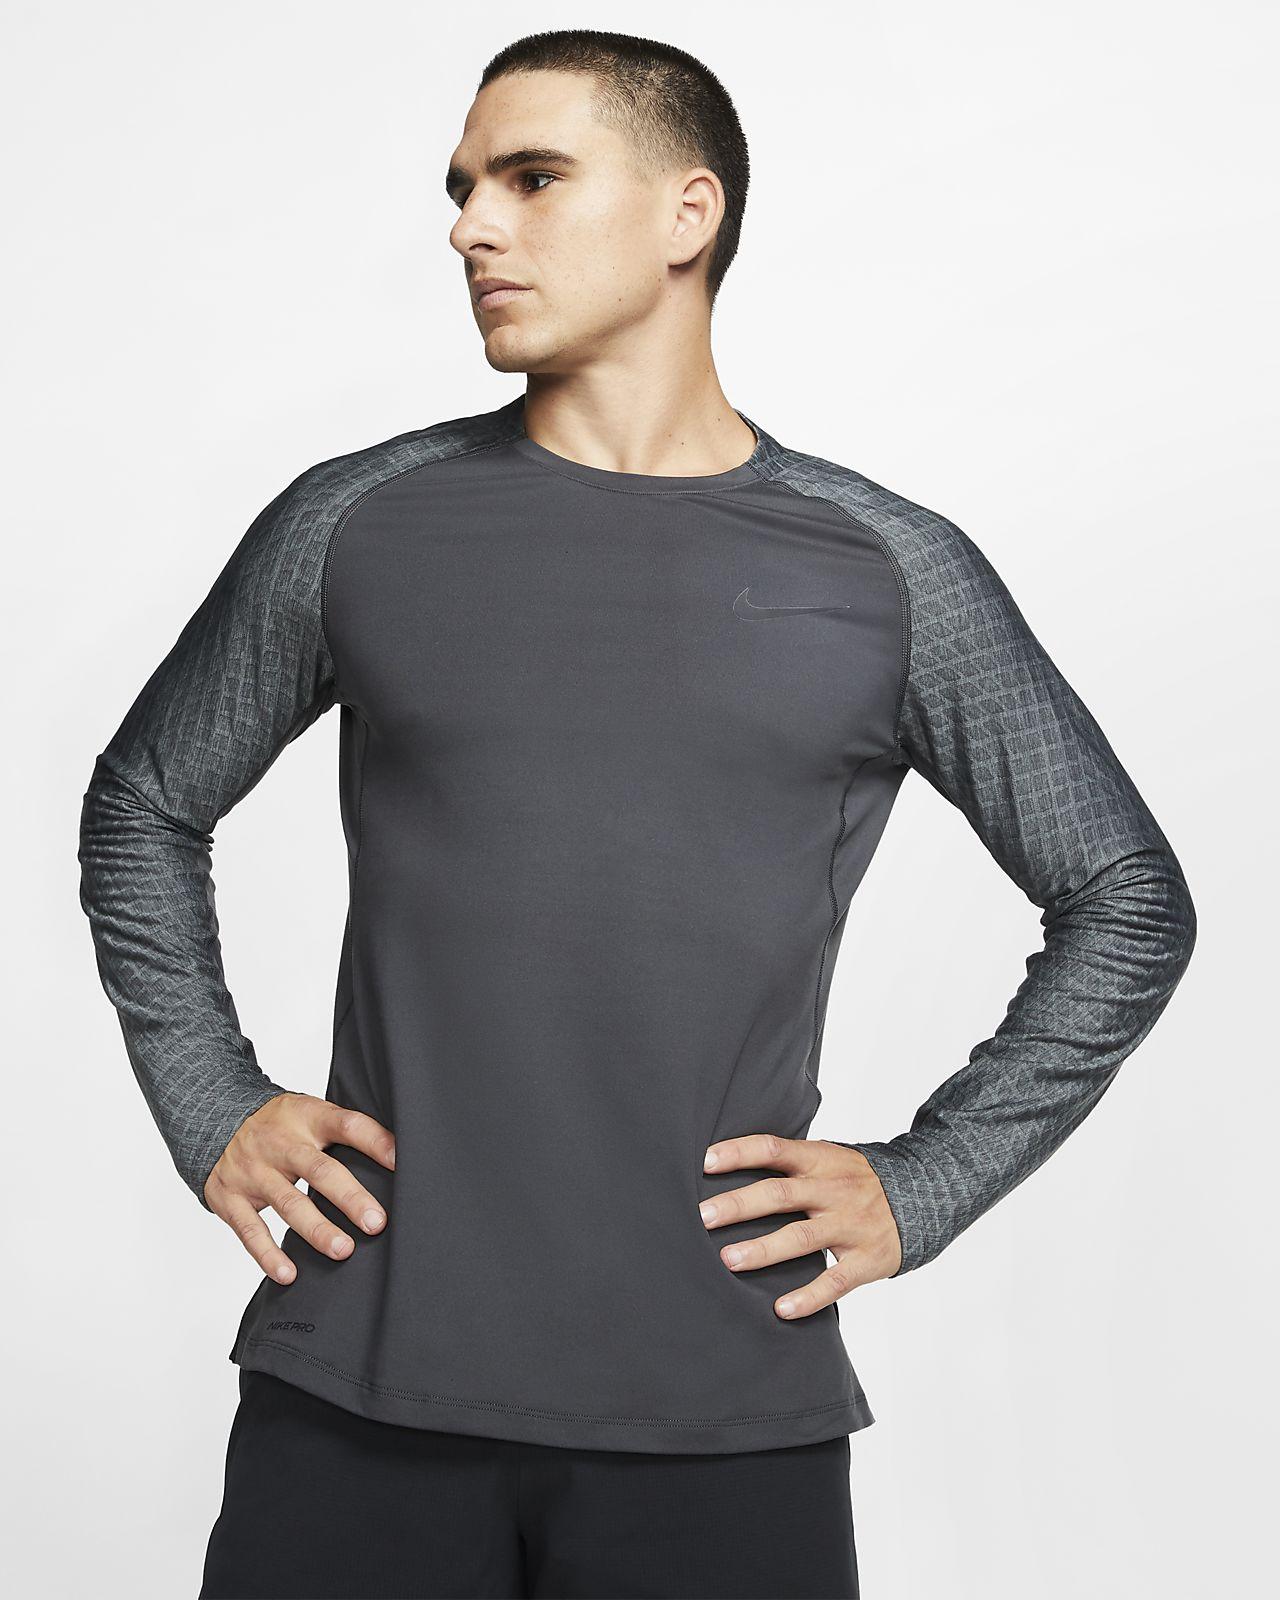 Maglia da training a manica lunga Nike Pro - Uomo